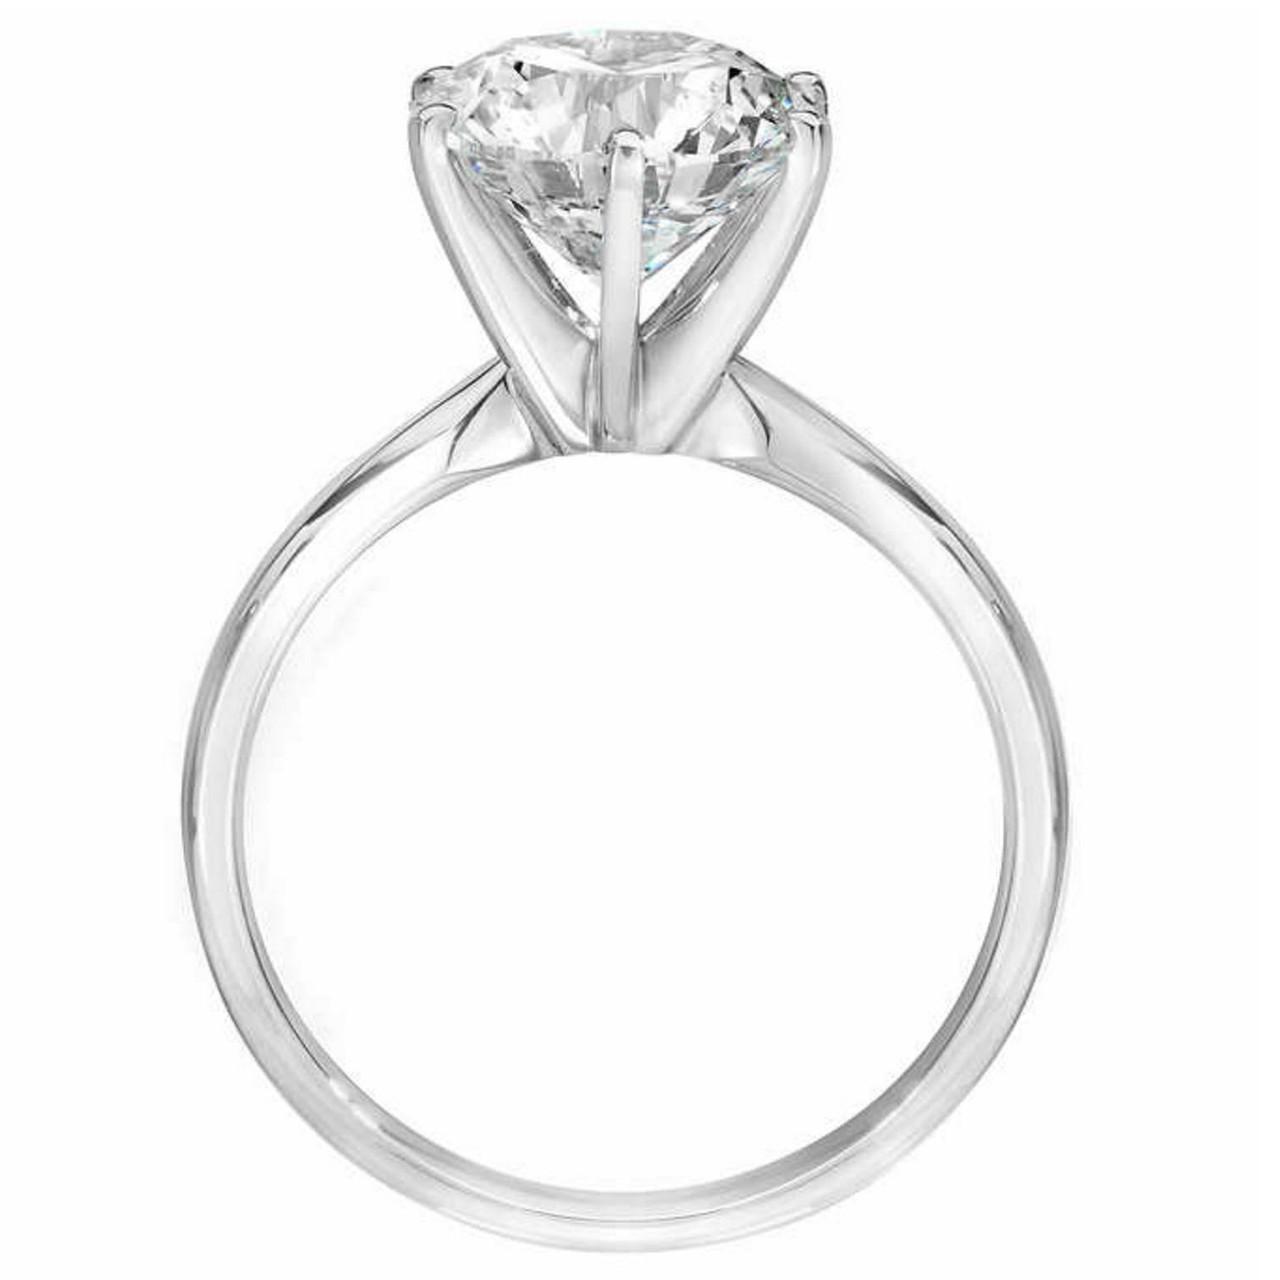 3ct Enhanced Round Diamond Solitaire Engagement Ring 14k